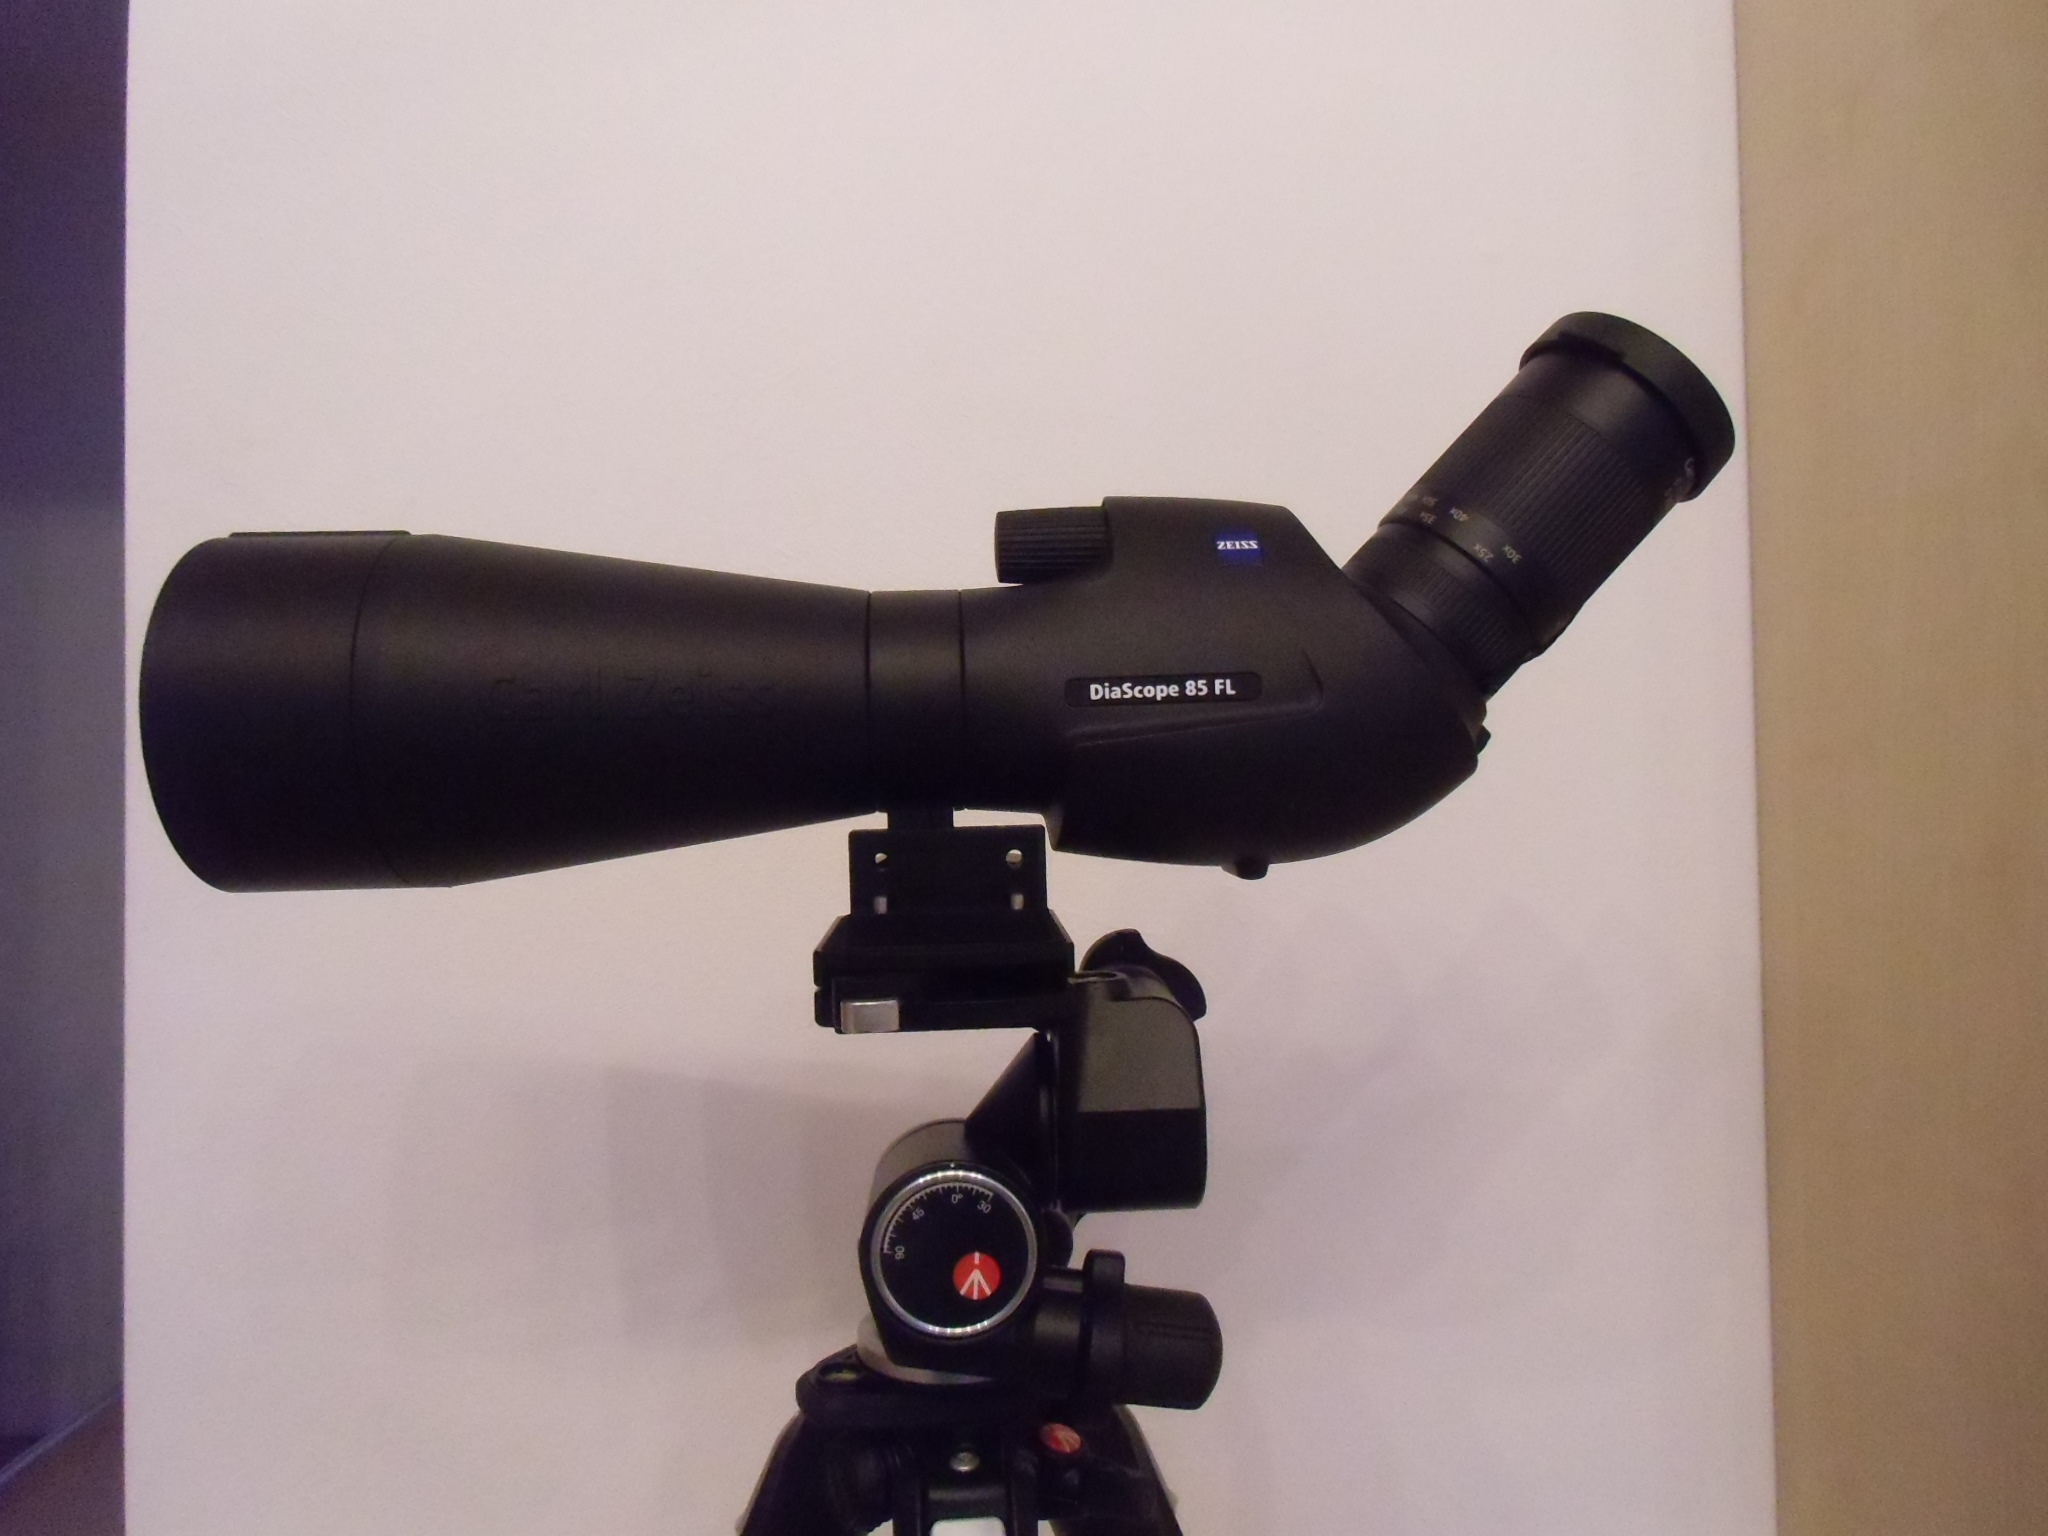 Zeiss Mit Entfernungsmesser : Spektiv zeiss diascope laser entfernungsmesser leica crf